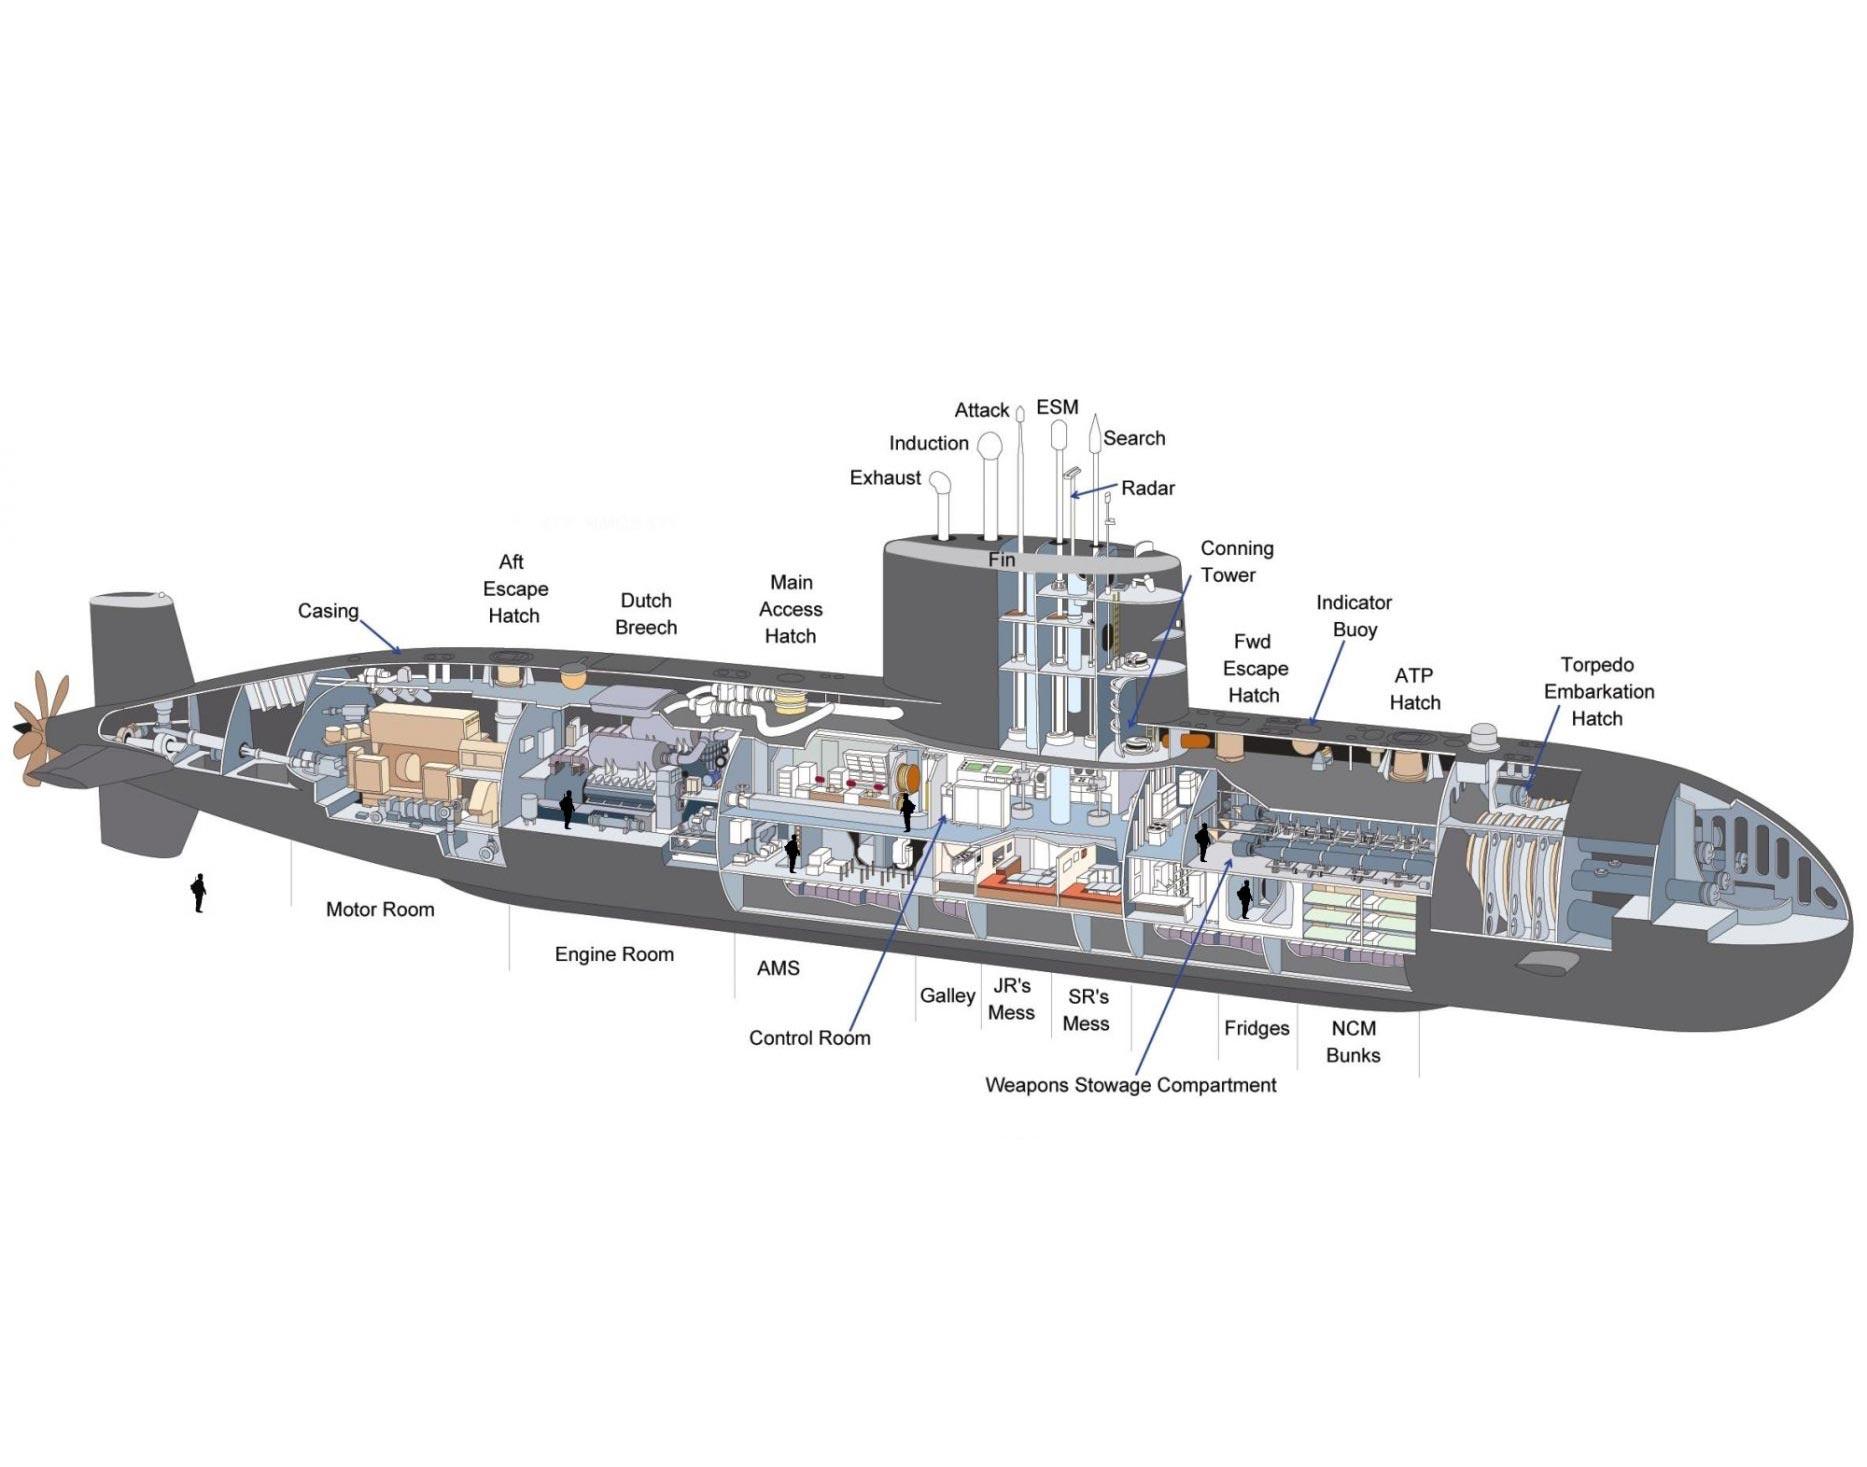 Victoria-class submarine cutaway